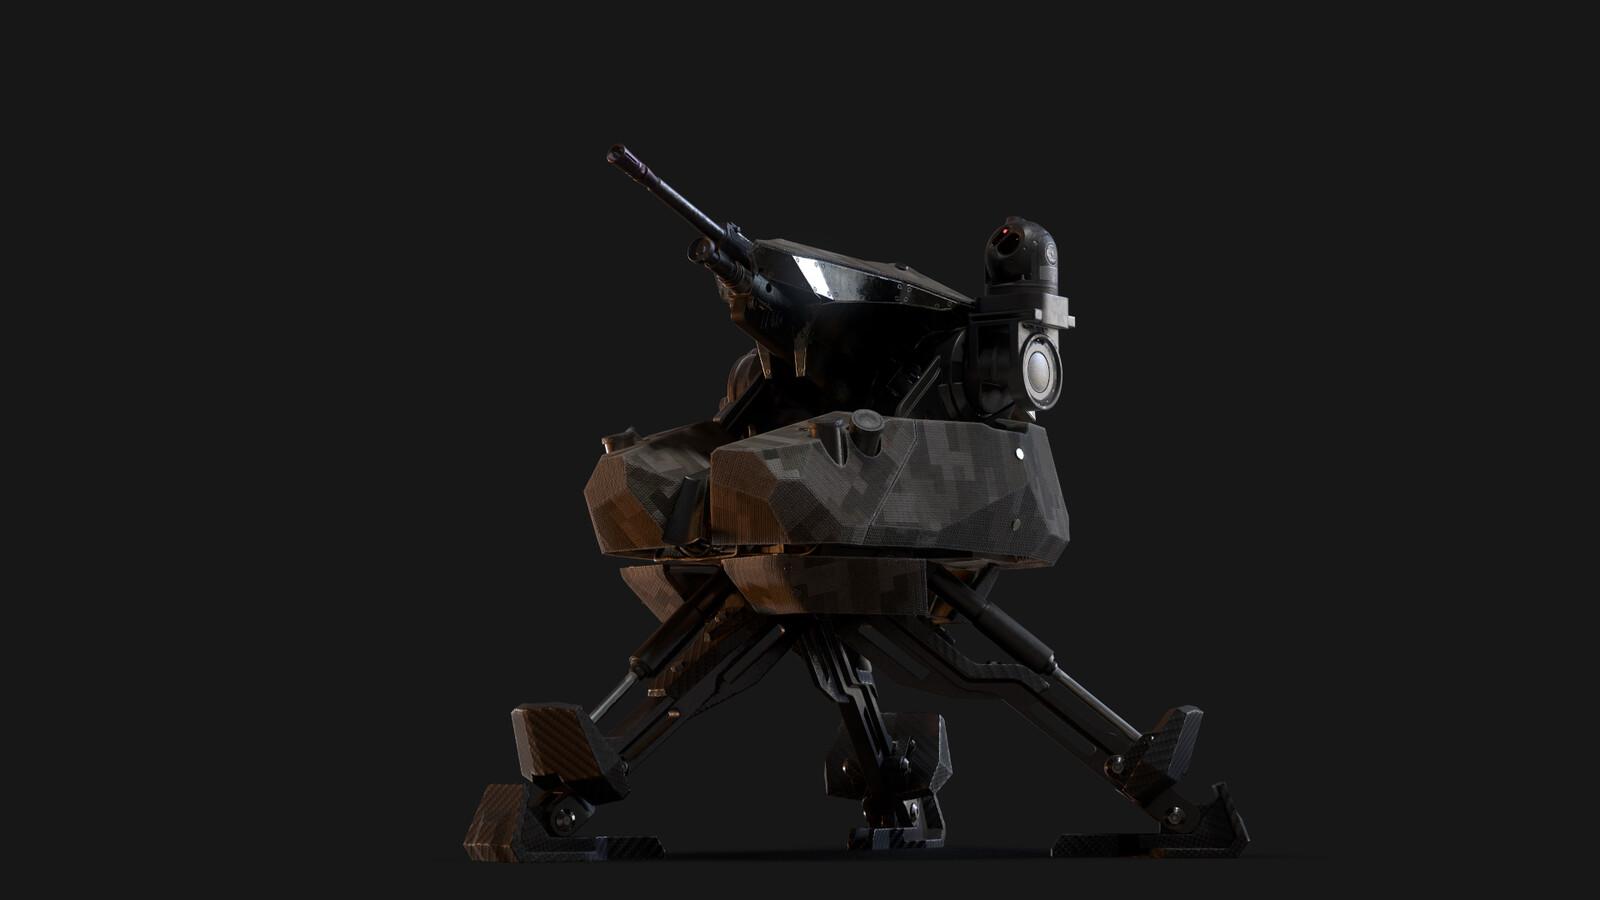 M.A.D.S. 249 automatic turret